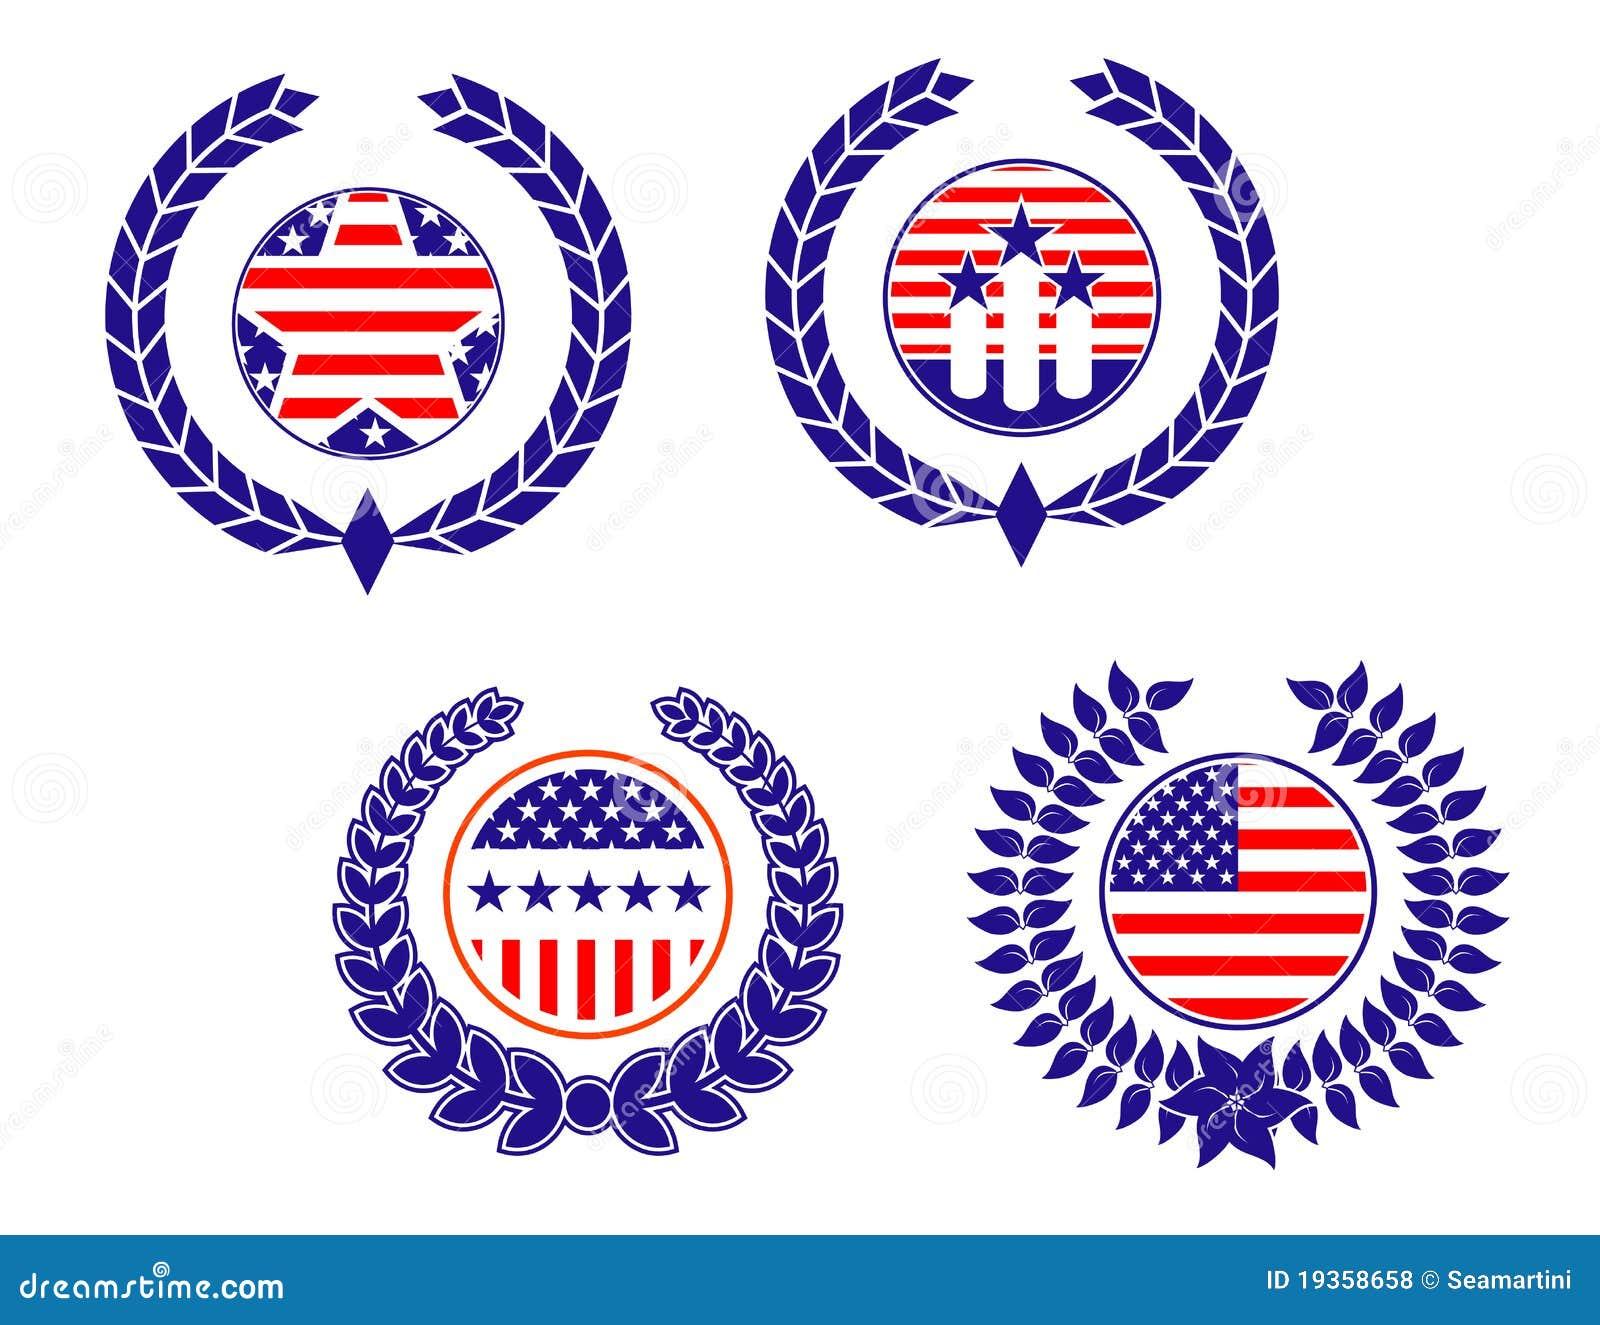 American Patriotic Symbols Stock Vector Illustration Of Government